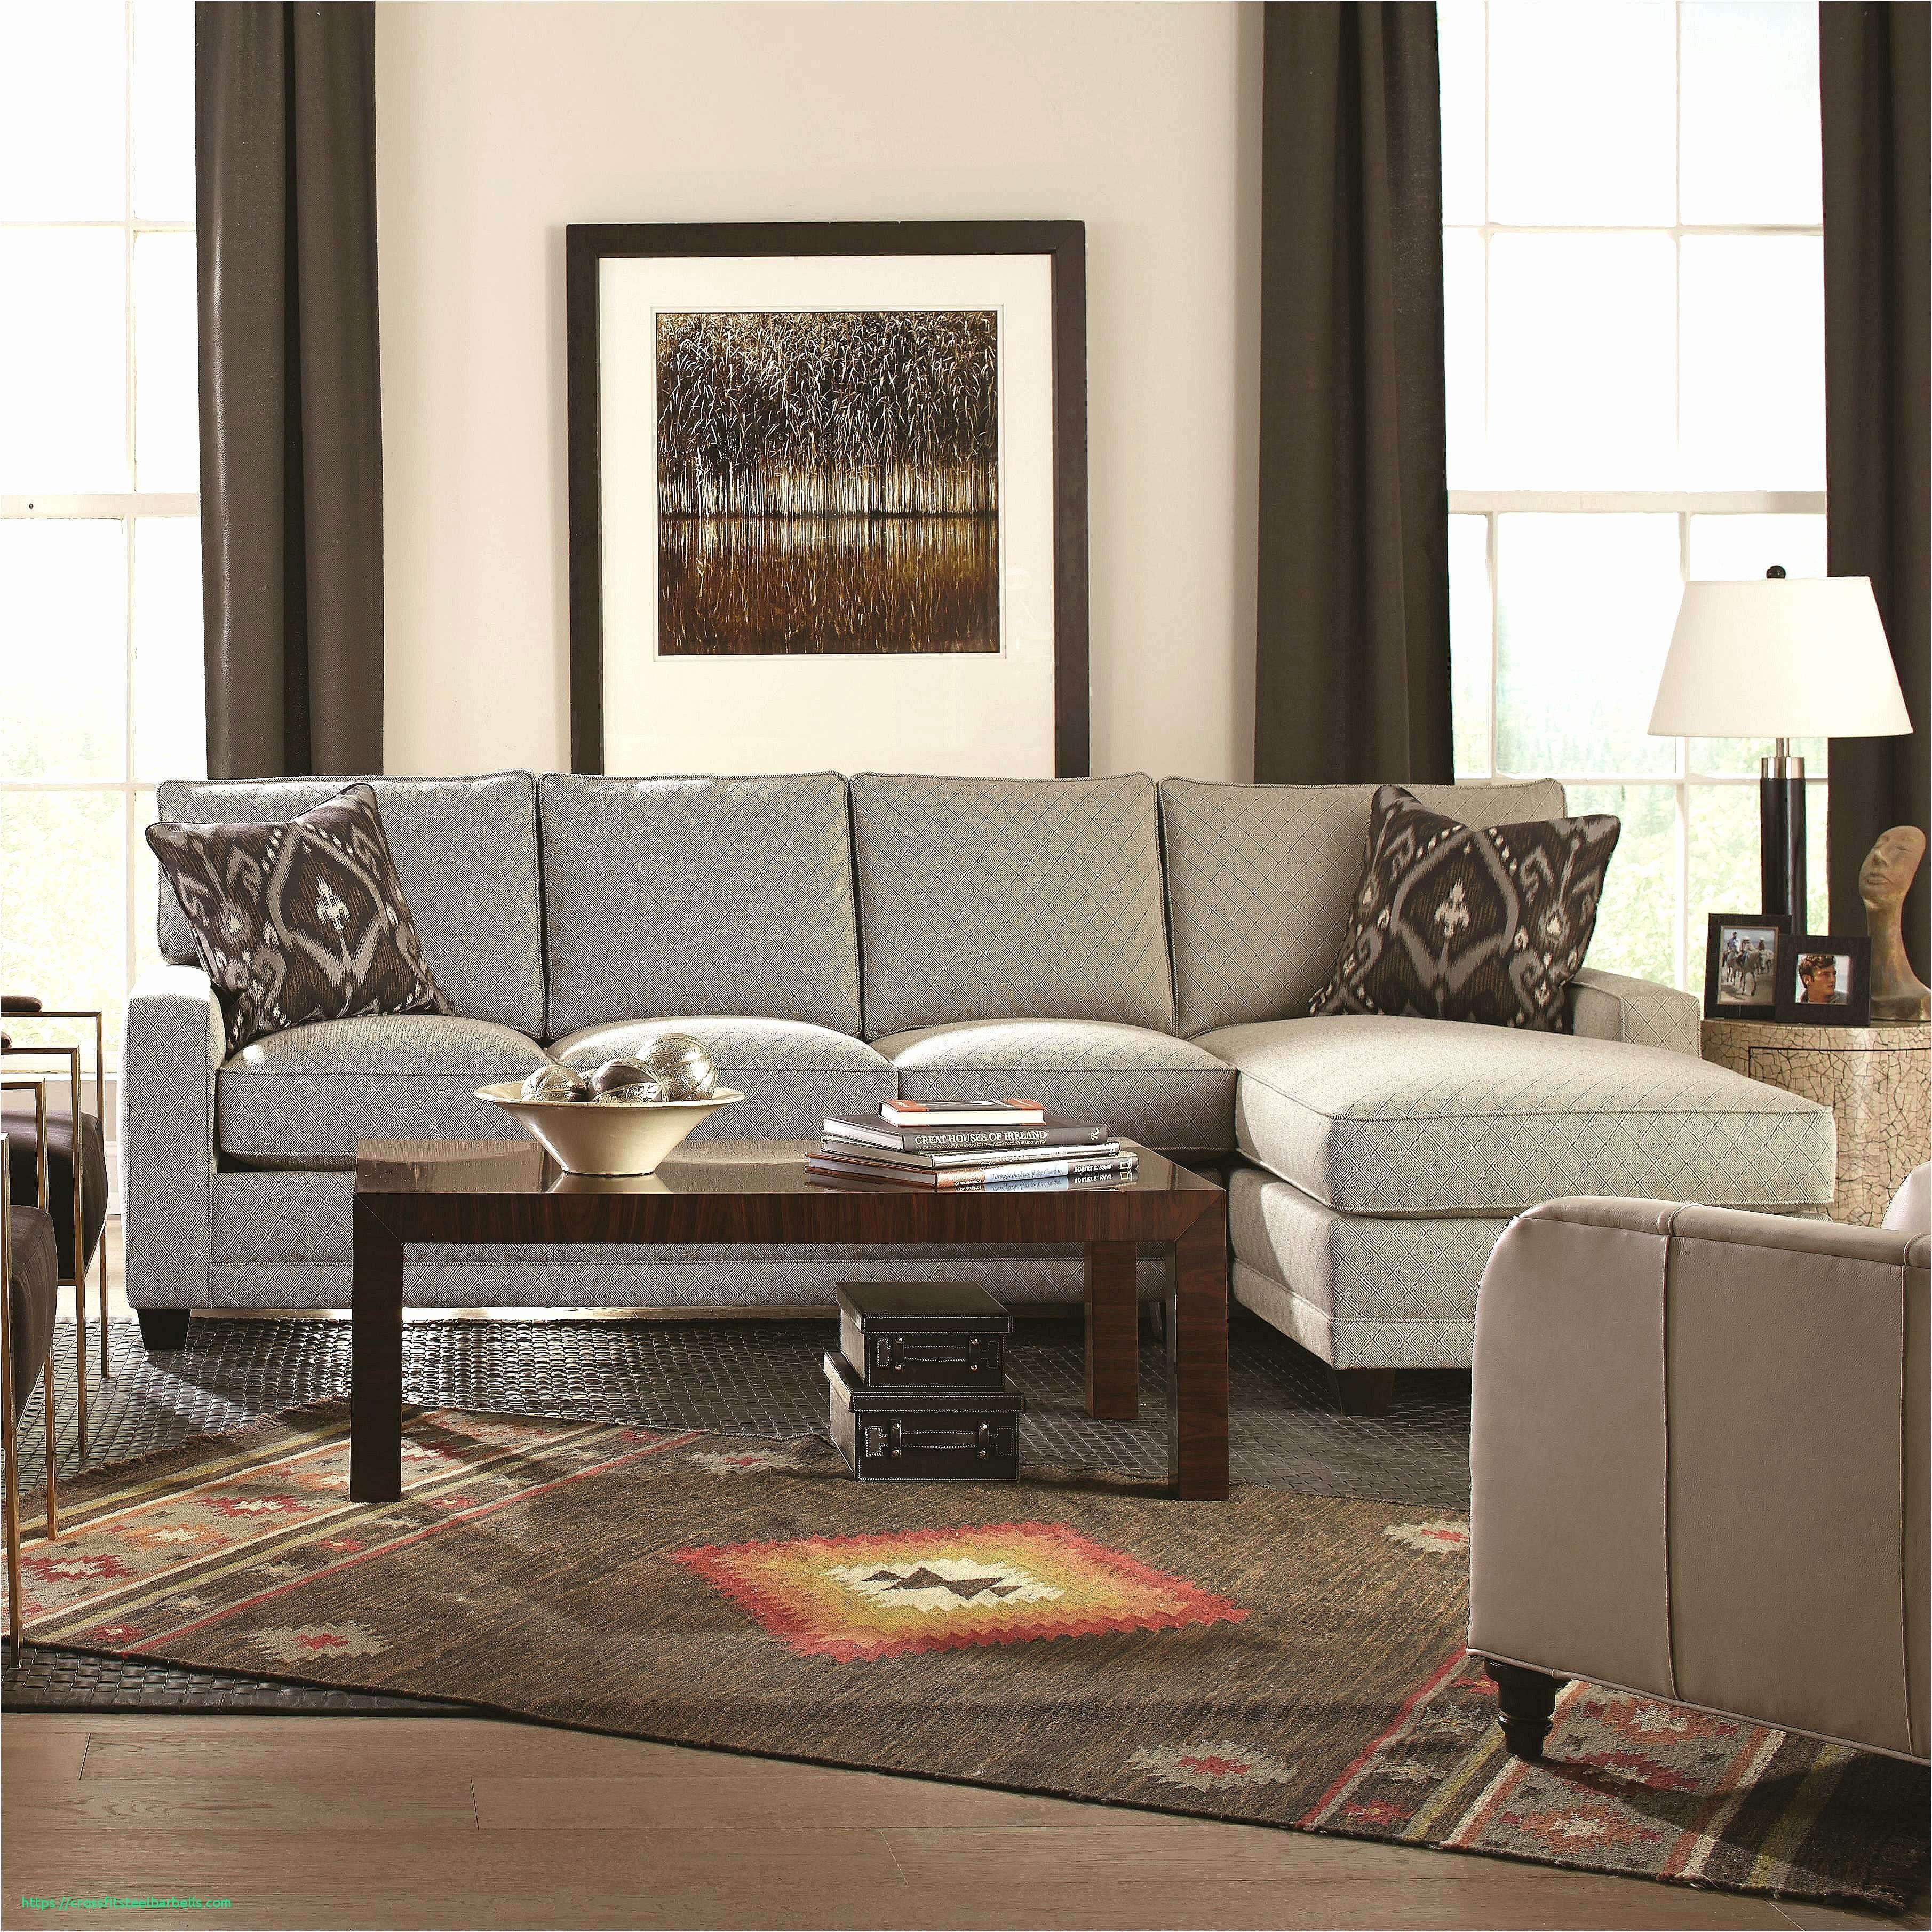 Furniture Decoration Ideas Interior Training In Nigeria Awe